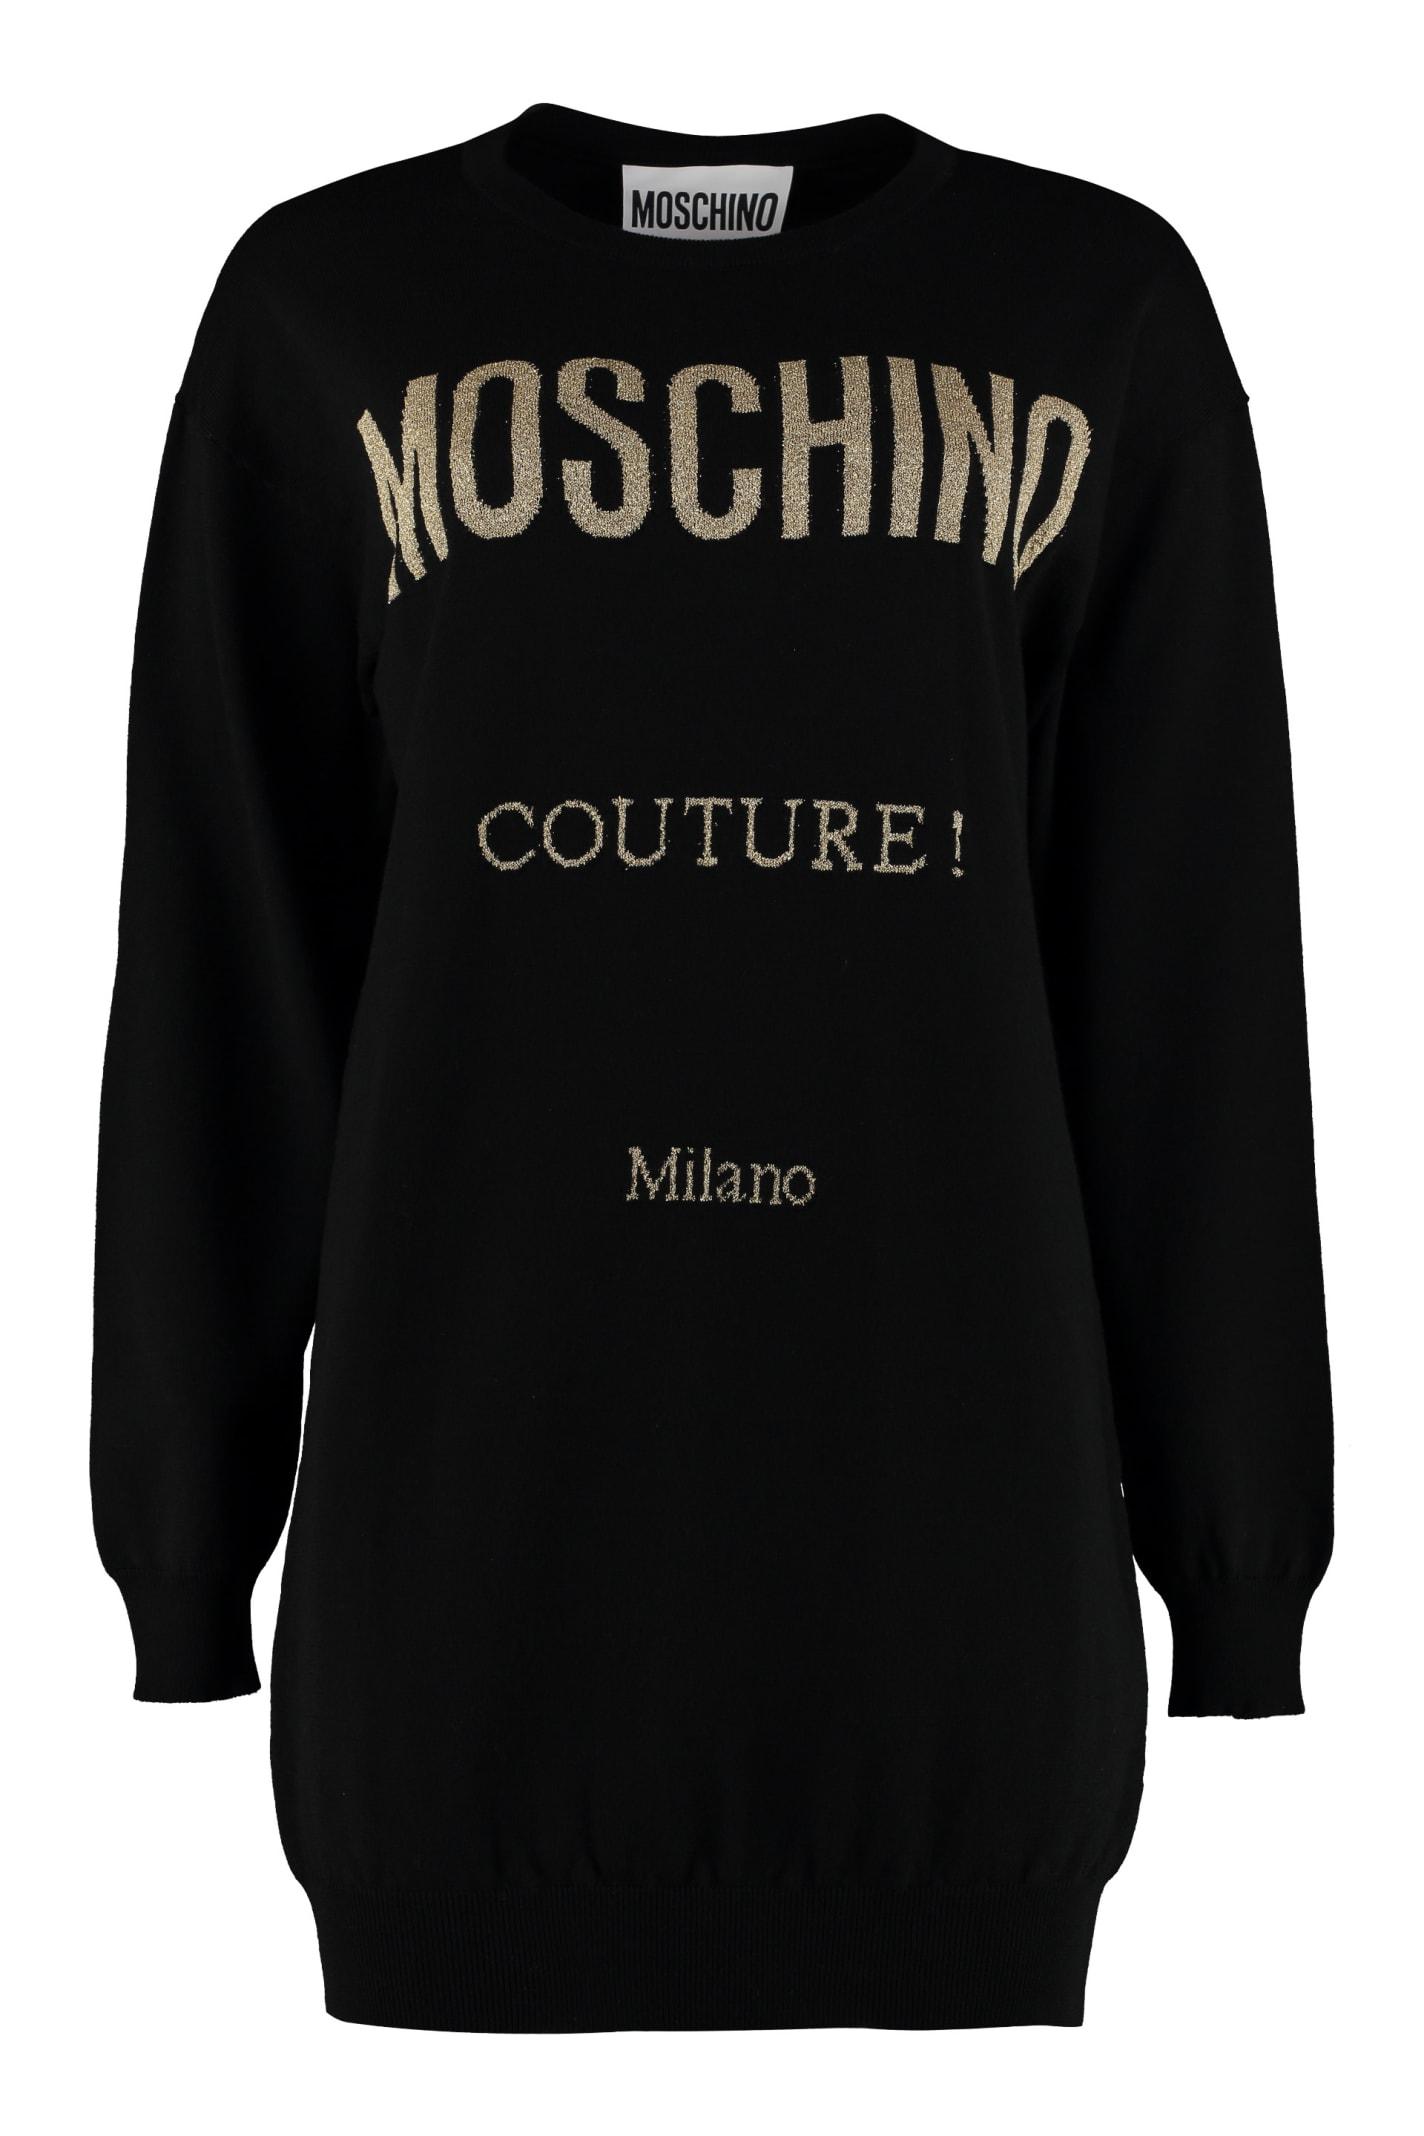 Moschino Intarsia Sweater Dress